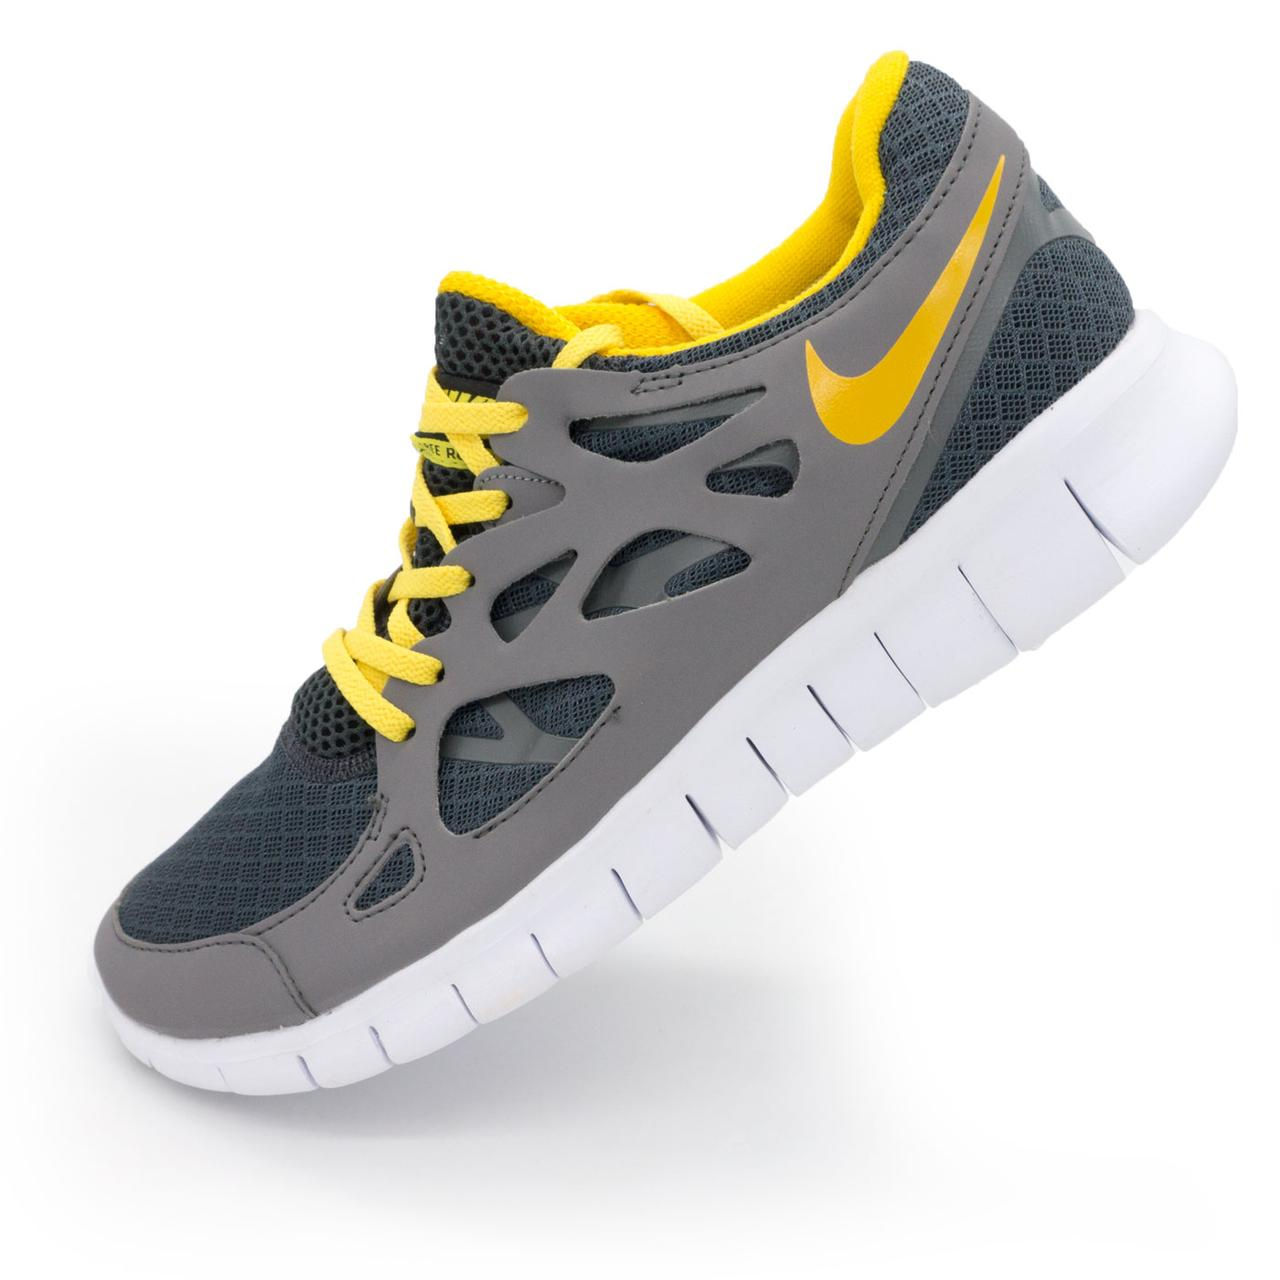 37f31c11 Мужские Кроссовки для Бега Nike Free Run 2 Найк Фри Ран, Серо-желтые ...